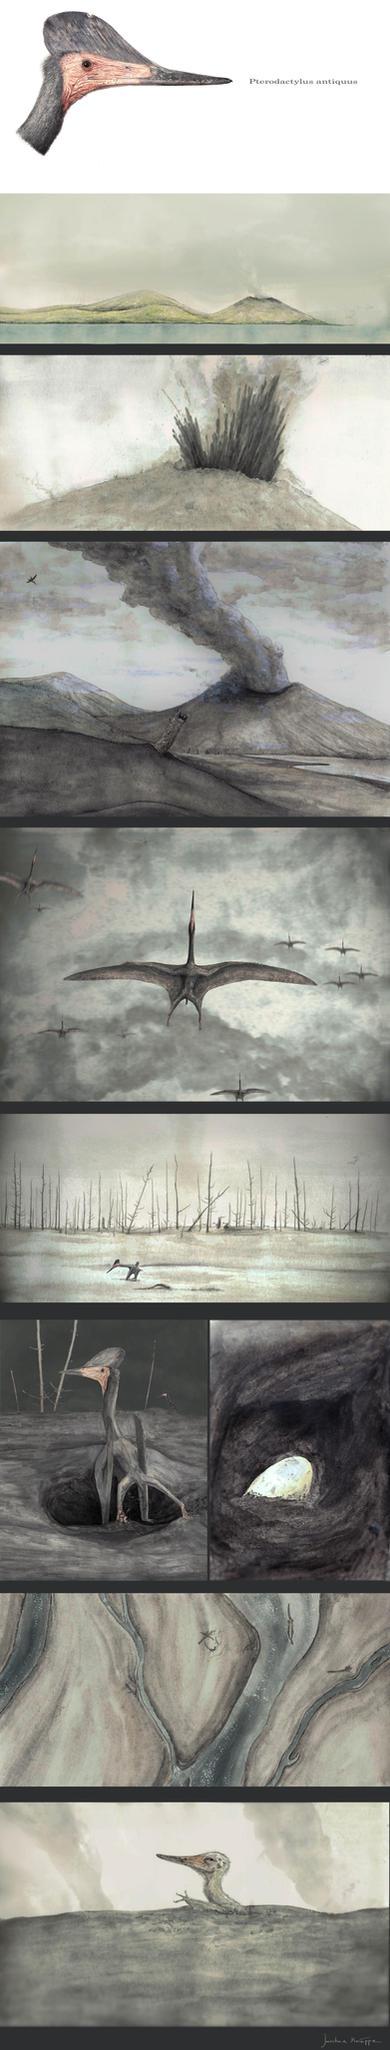 Pterodactylus by Hyrotrioskjan